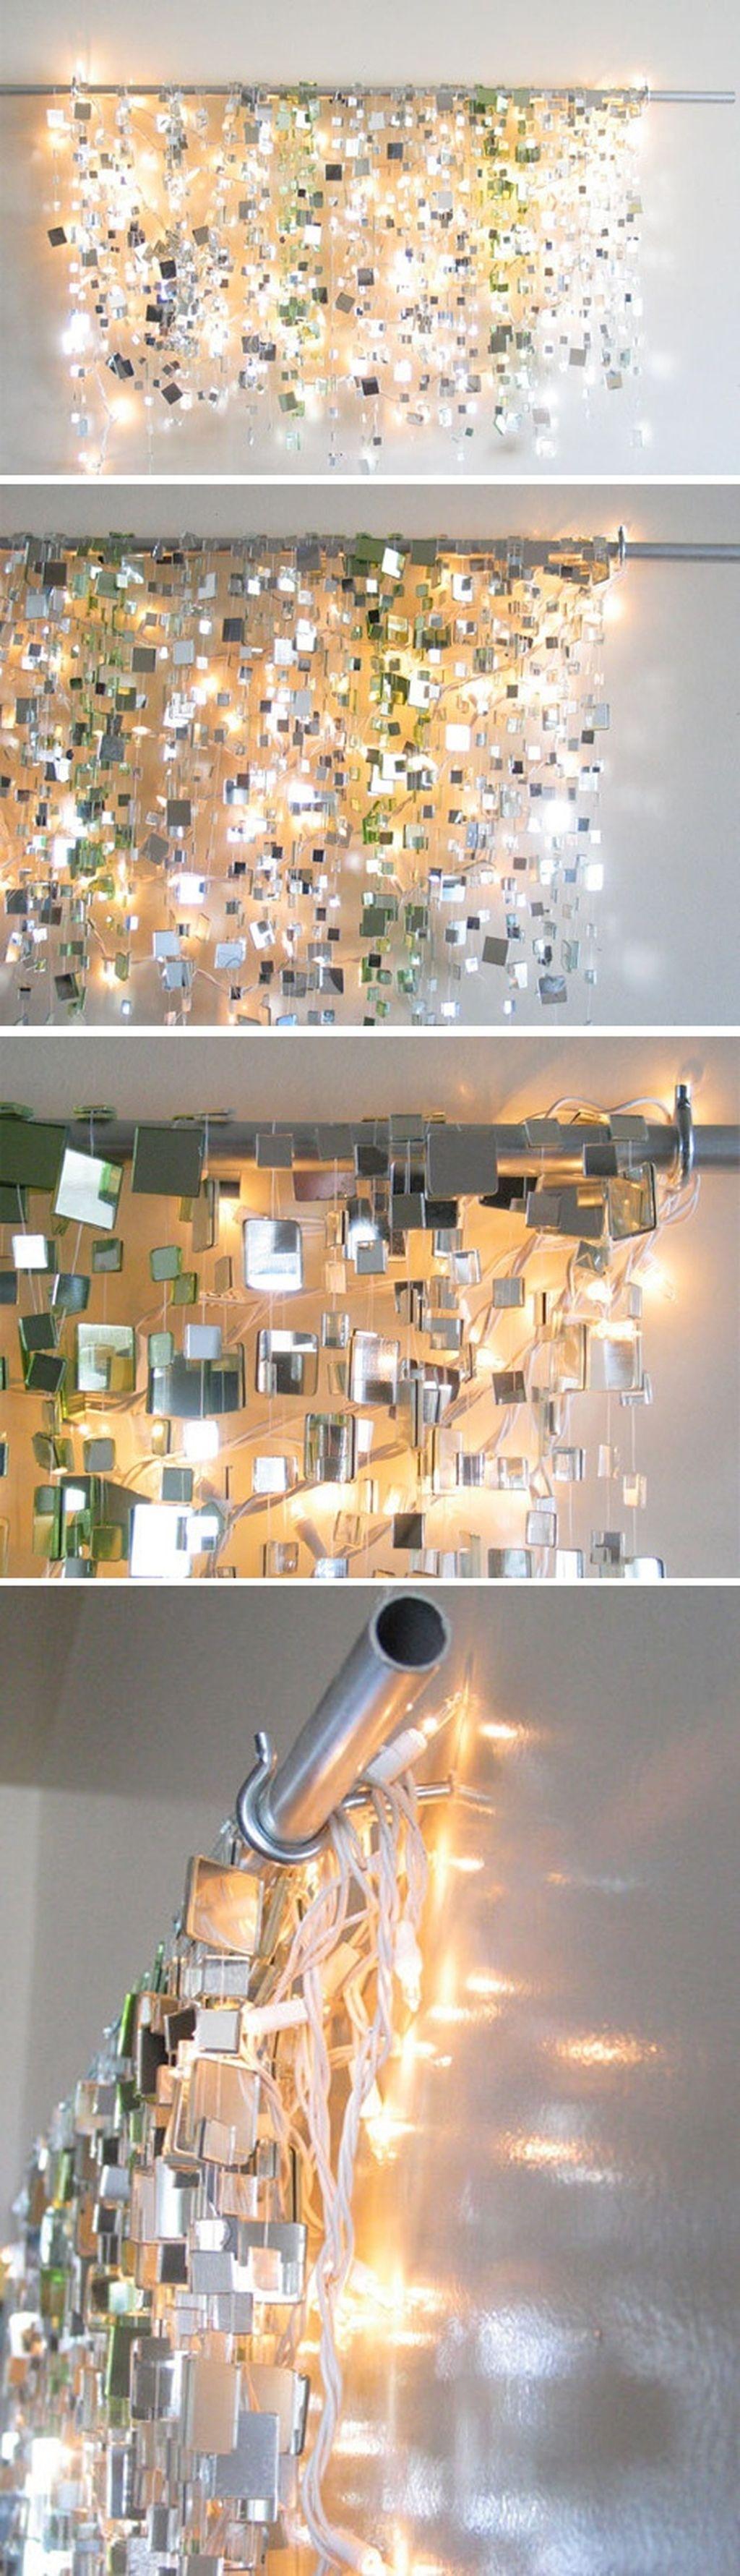 Creative Diy Room Decoration Ideas For Winter 34